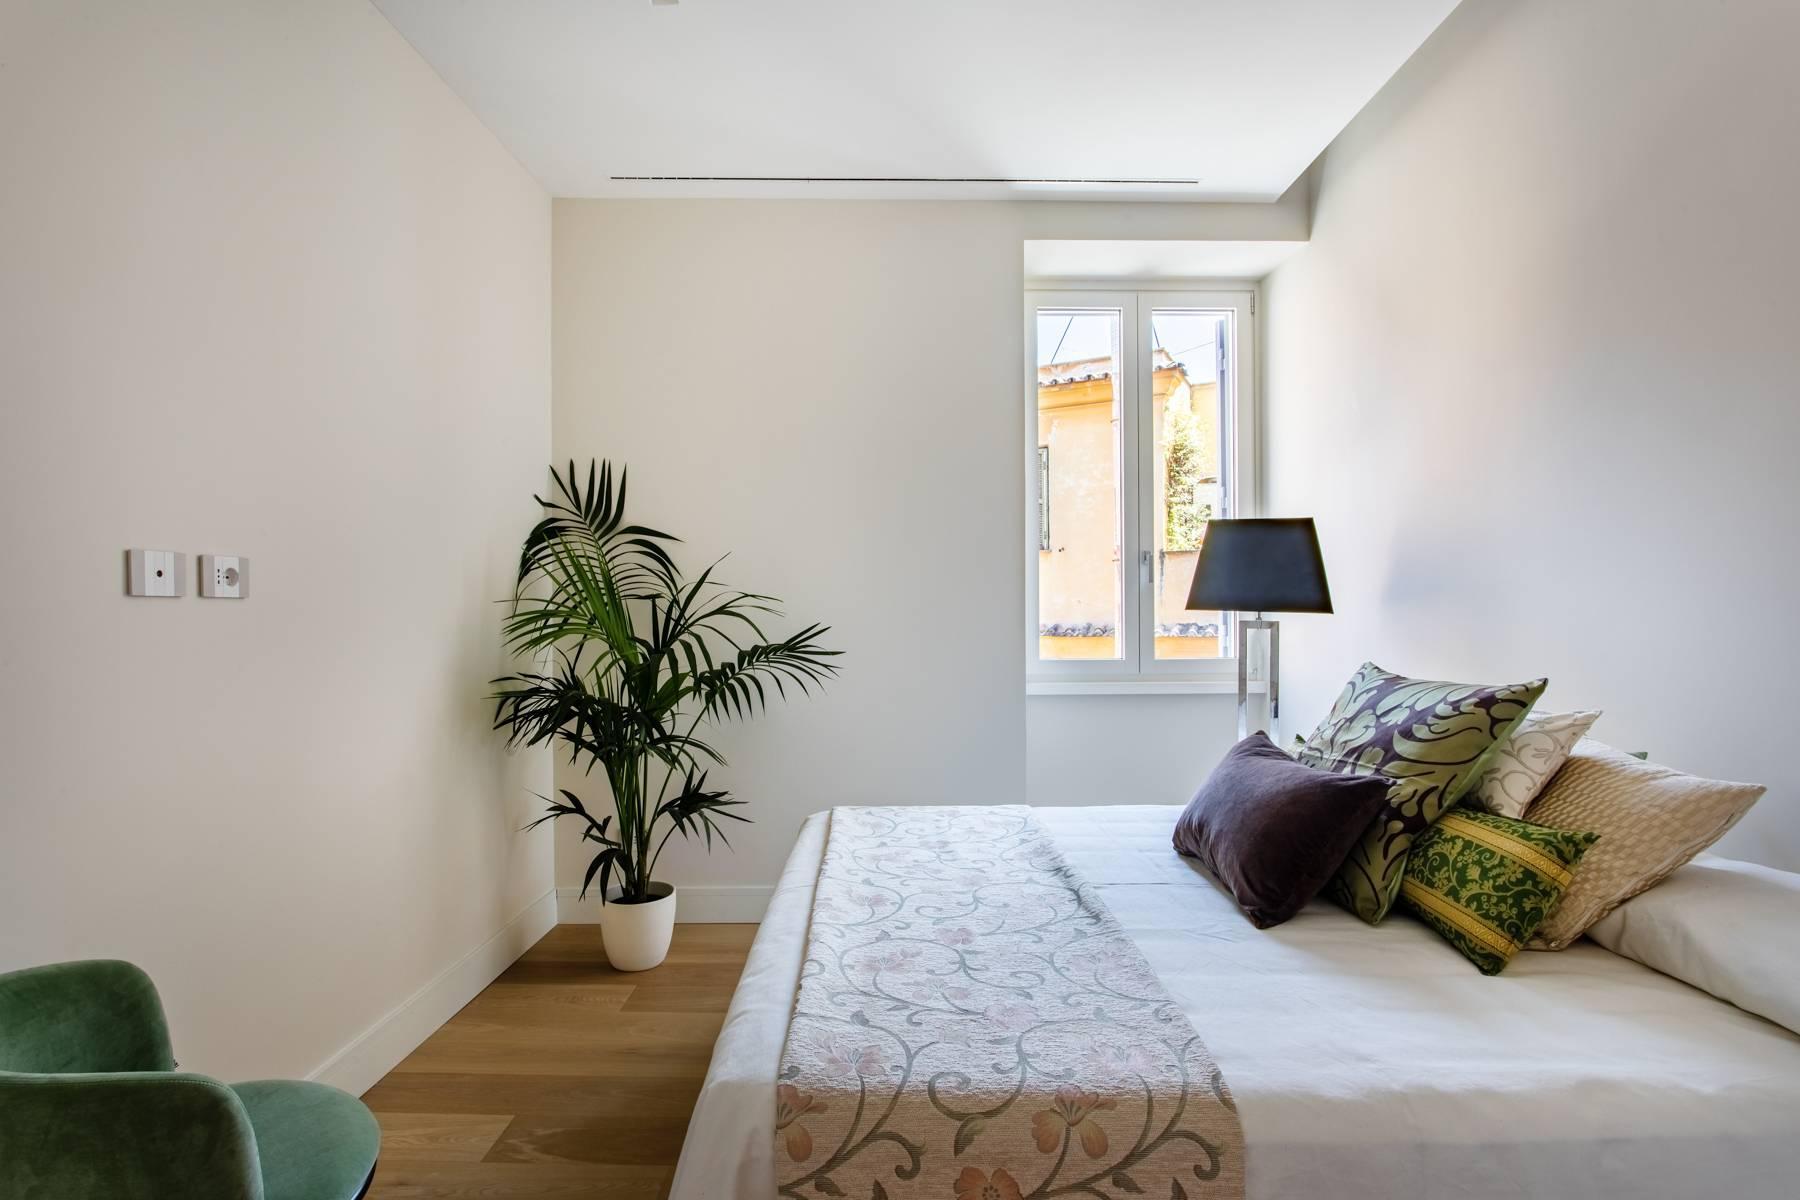 Spanish Steps luxury turnkey apartment - 2